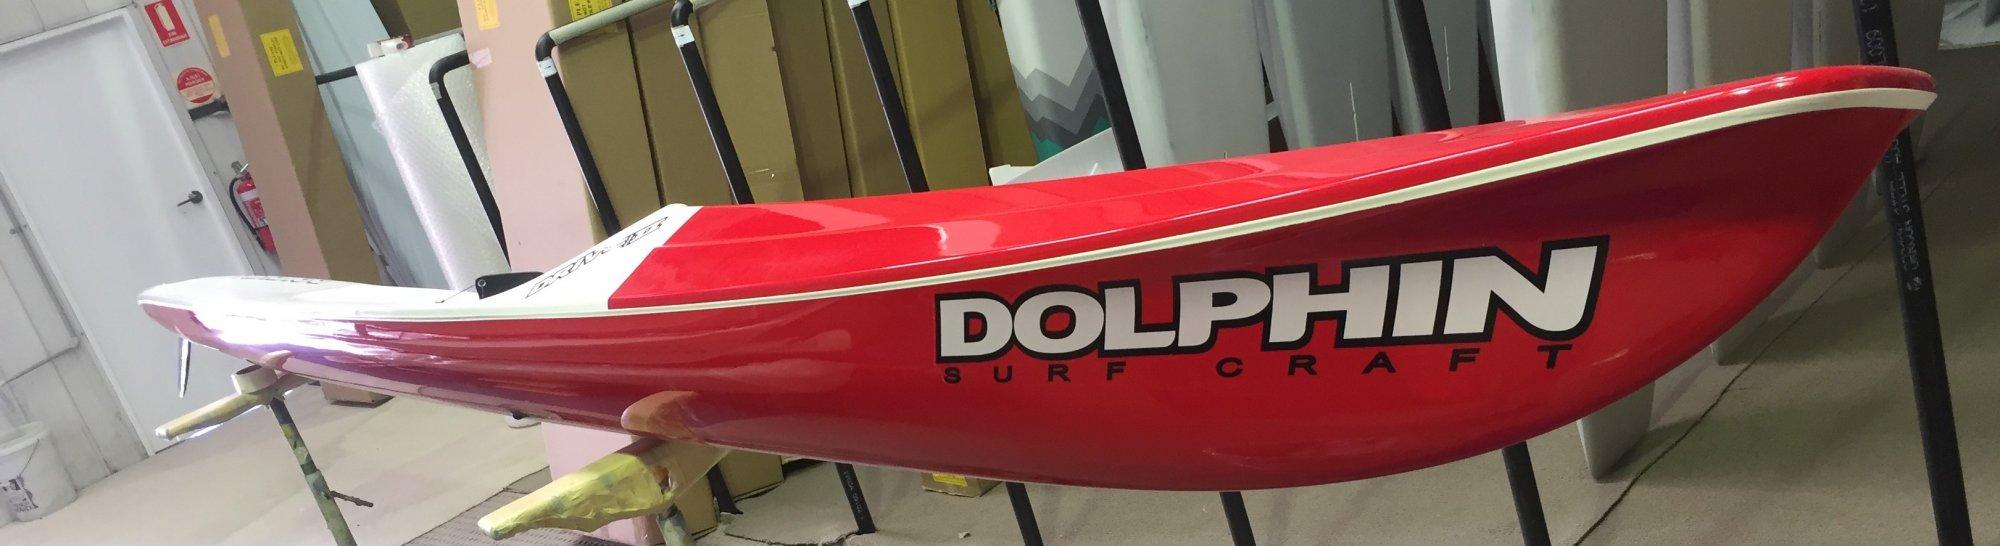 Dolphin Adjustable Drive II Surf Ski 19' - 974